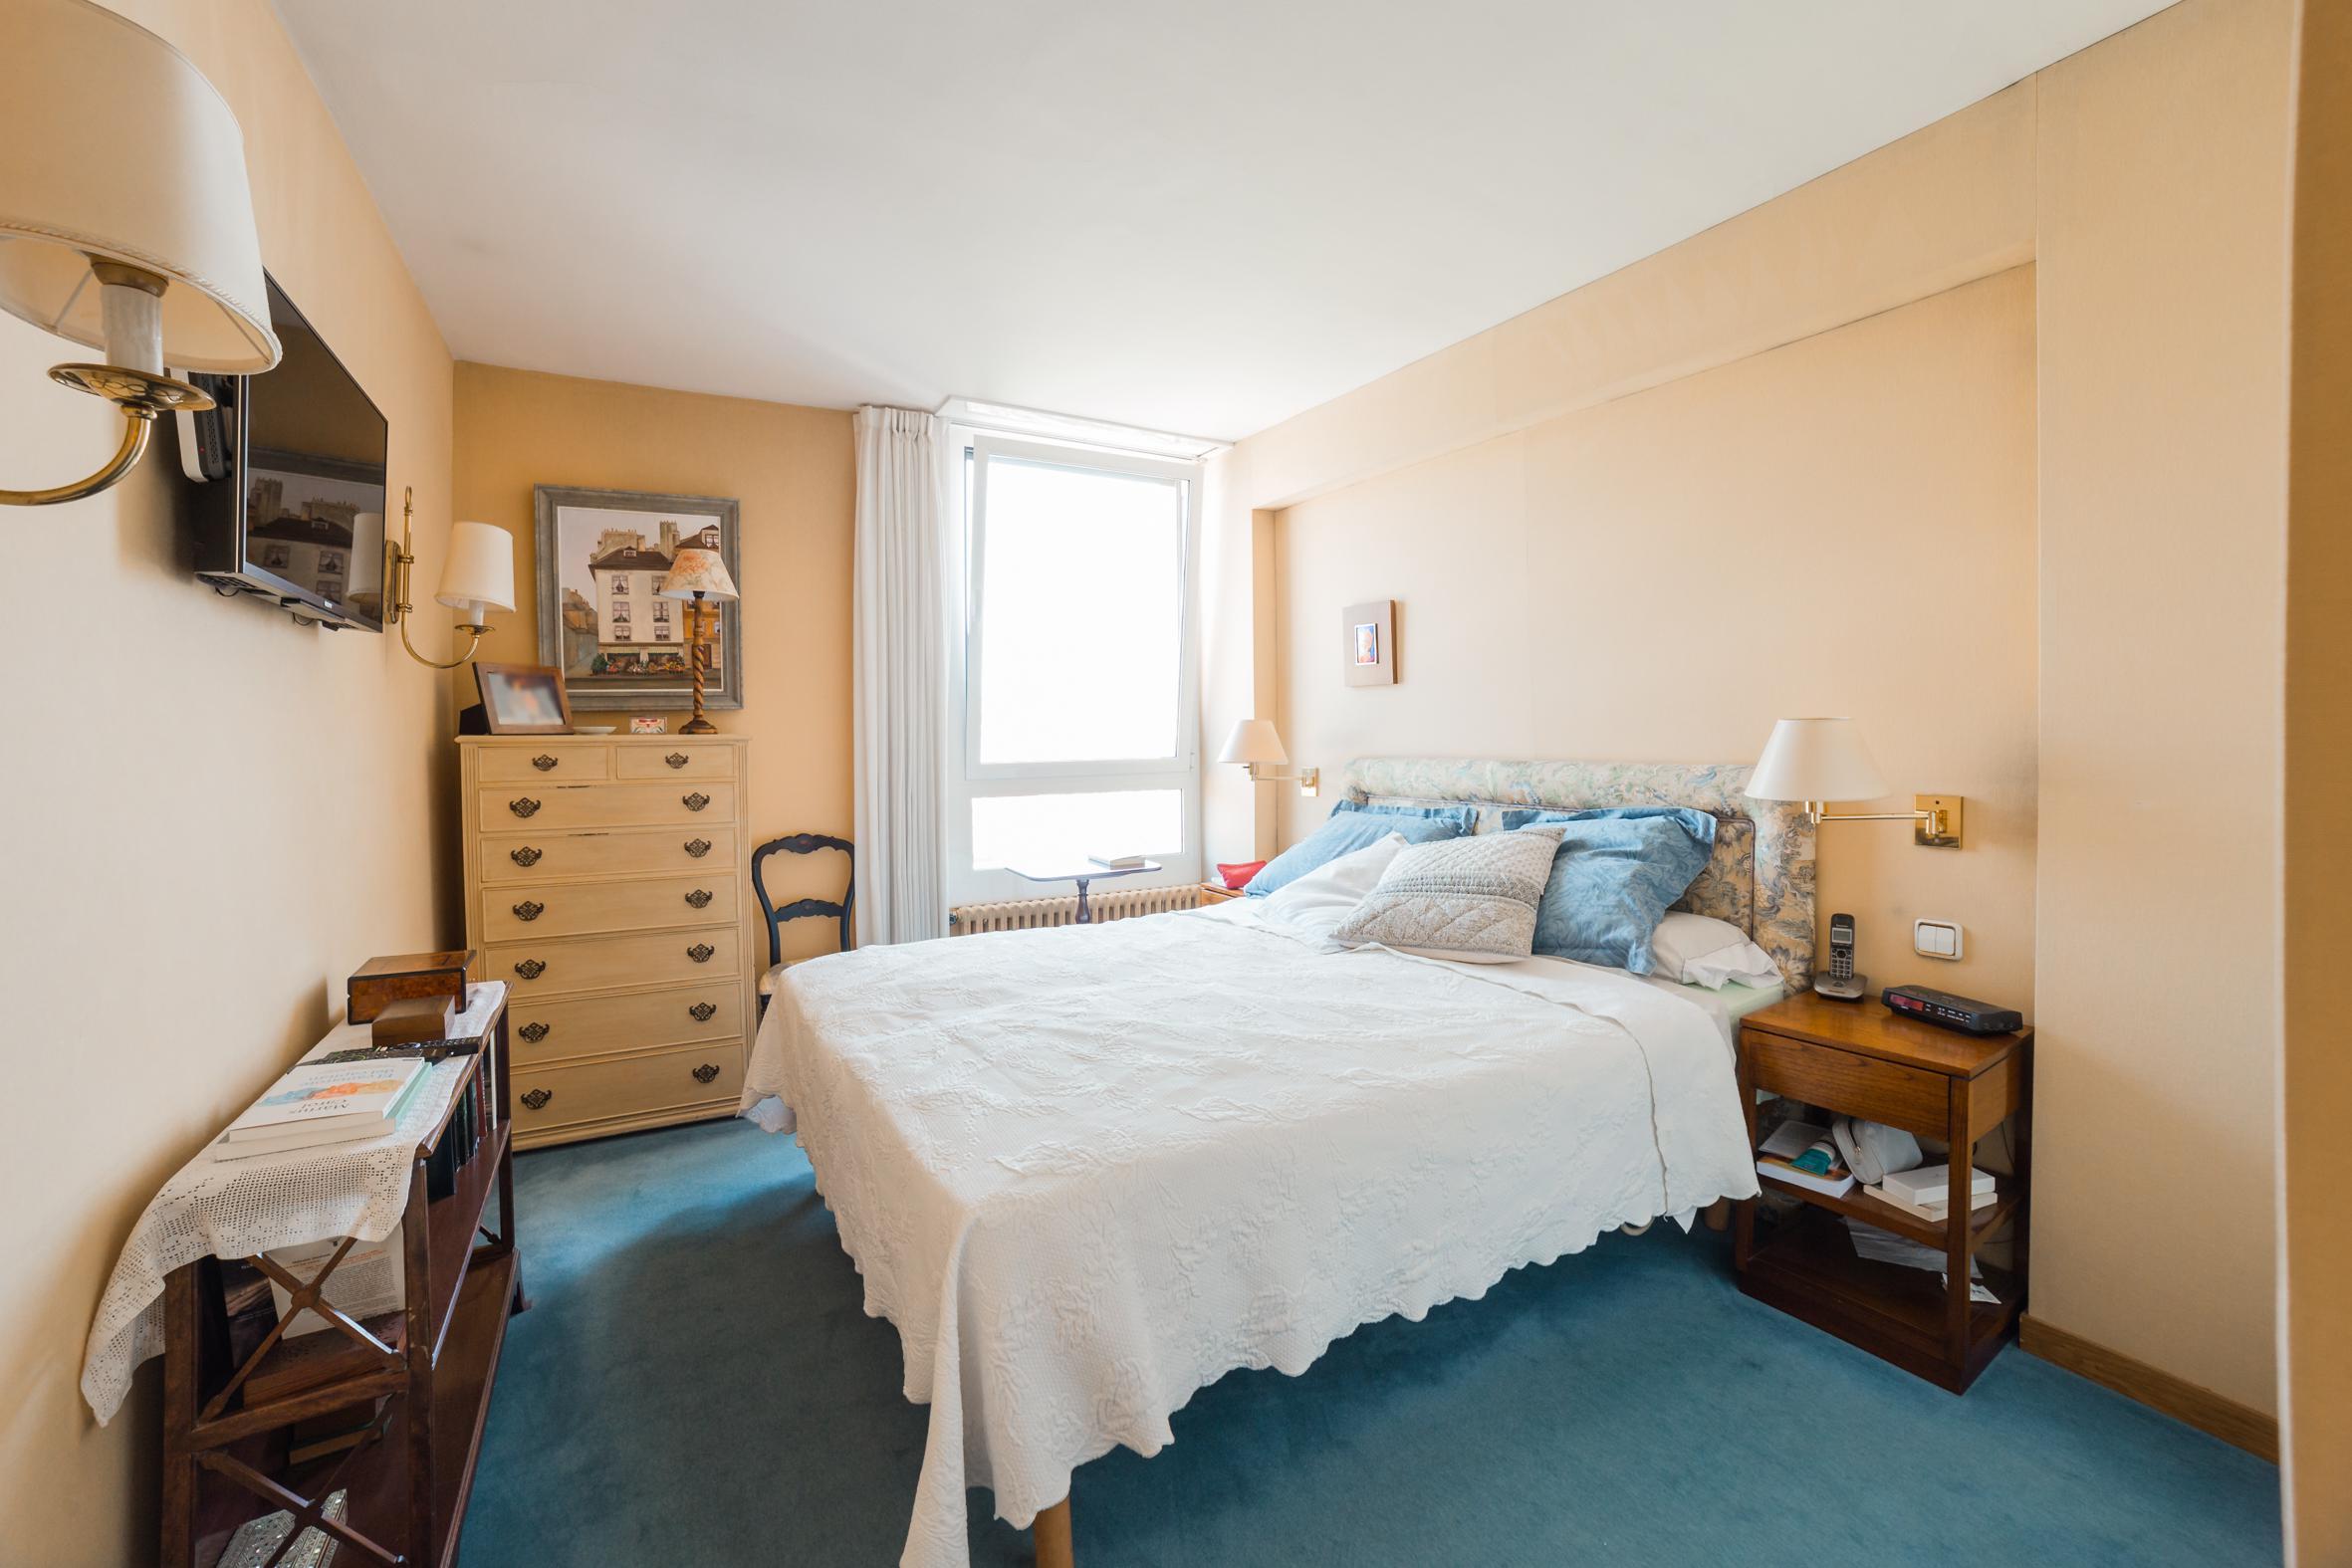 253515 Apartamento en venta en Sarrià-Sant Gervasi, Sant Gervasi-Galvany 20